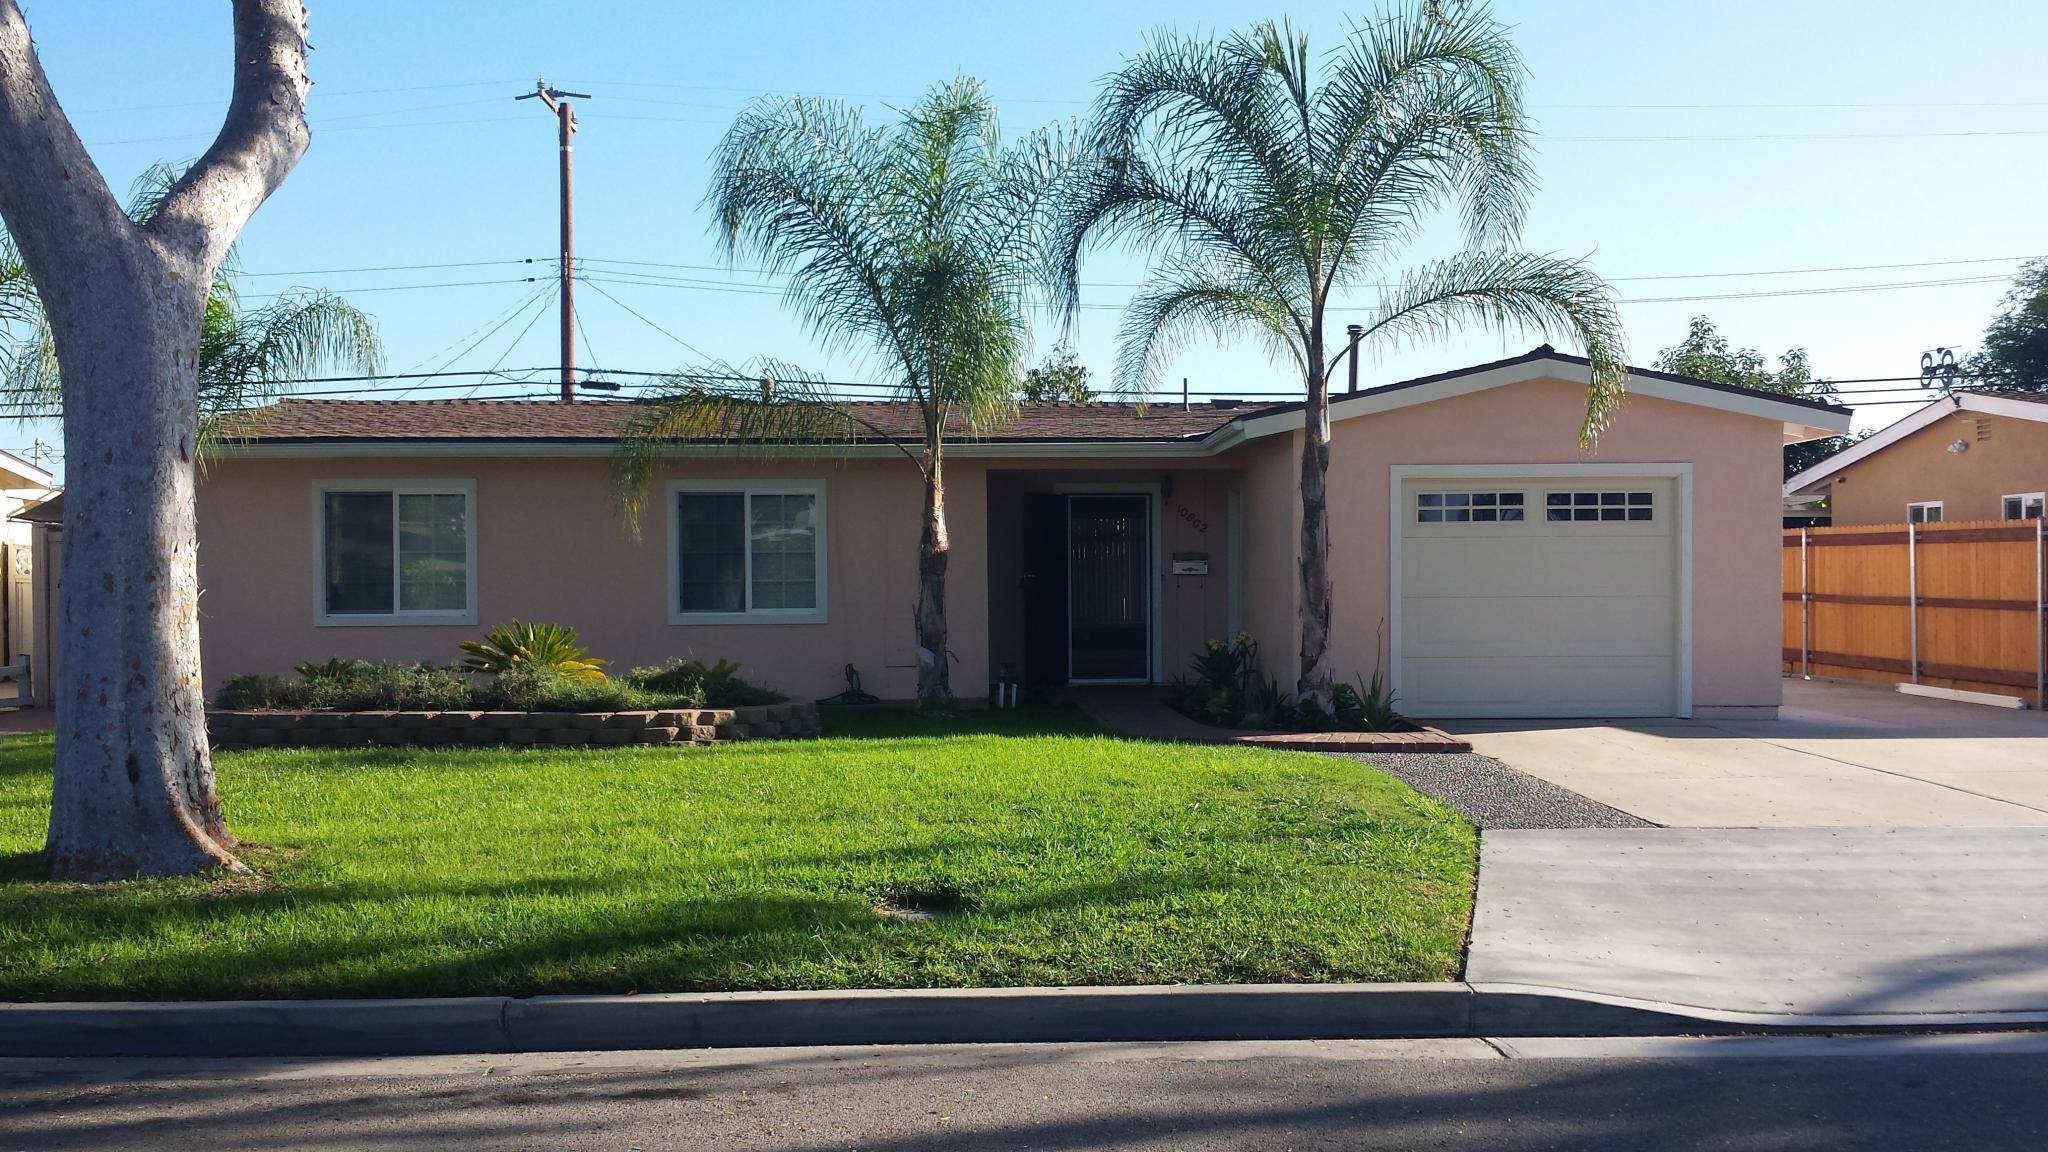 10802 Woodbury Rd For Rent - Garden Grove, CA | Trulia